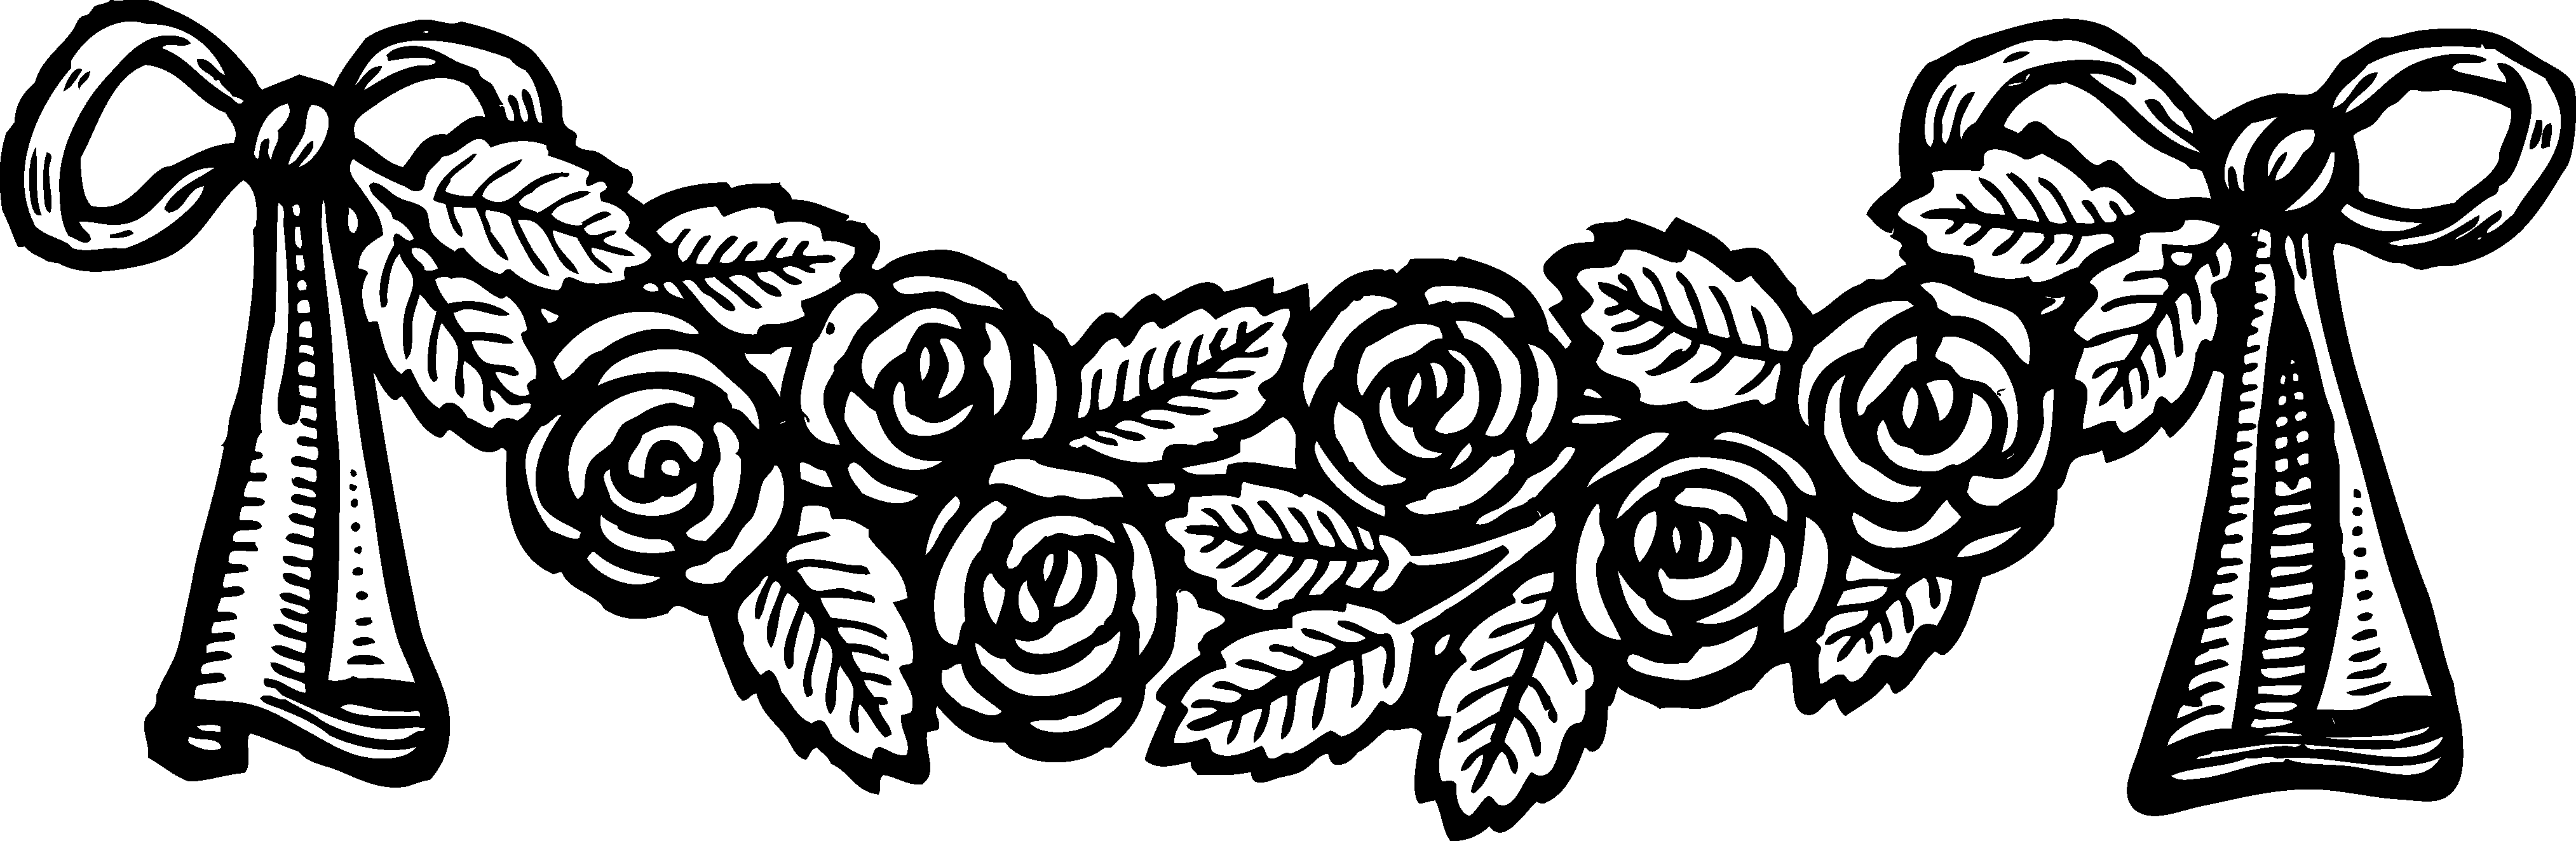 Clipart rose banner. Vintage roses decoration free